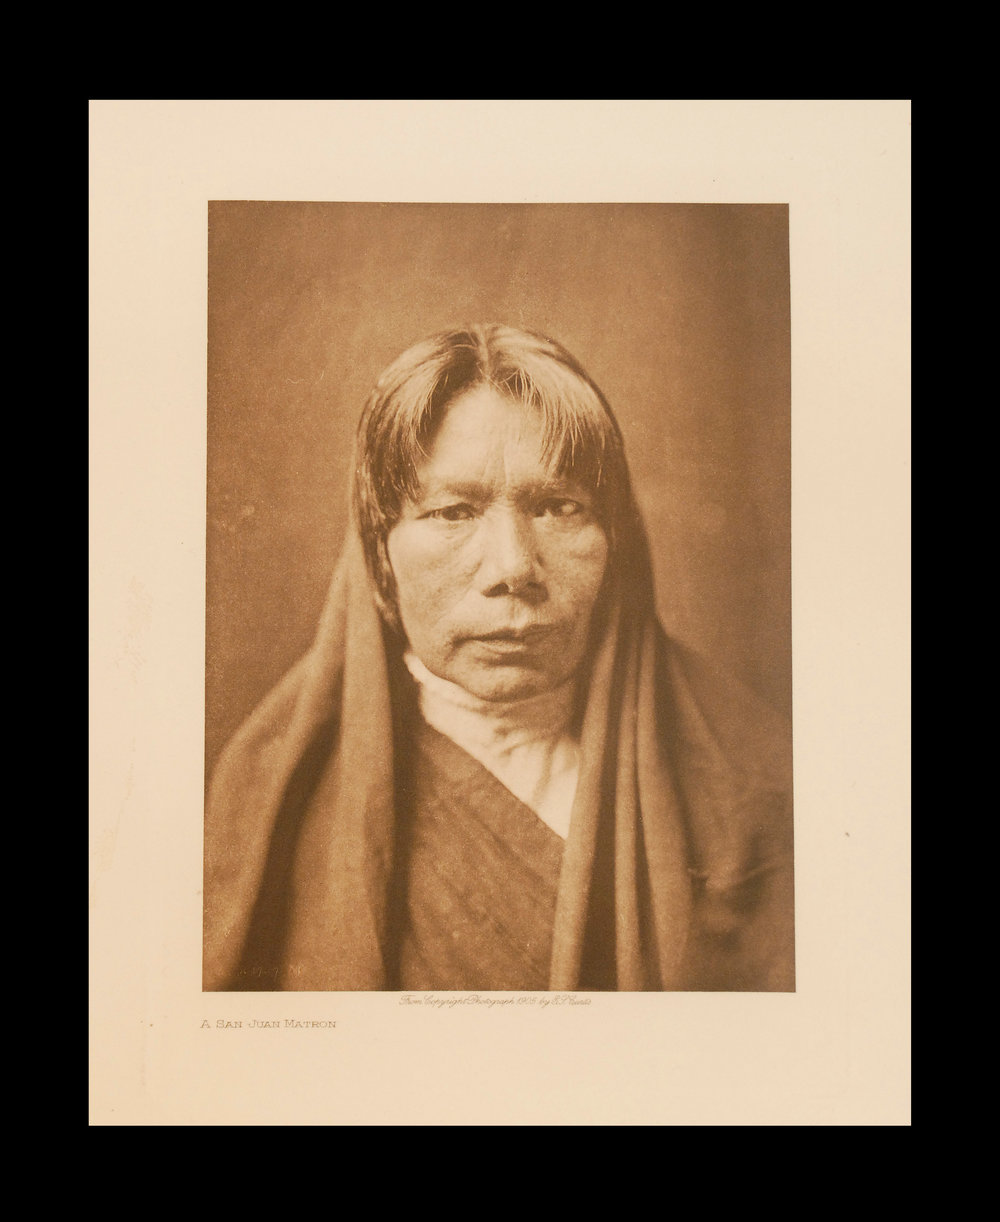 """A San Juan Matron"" 1905 Vol.17 Van Gelder prin t, V intage Photogravure"